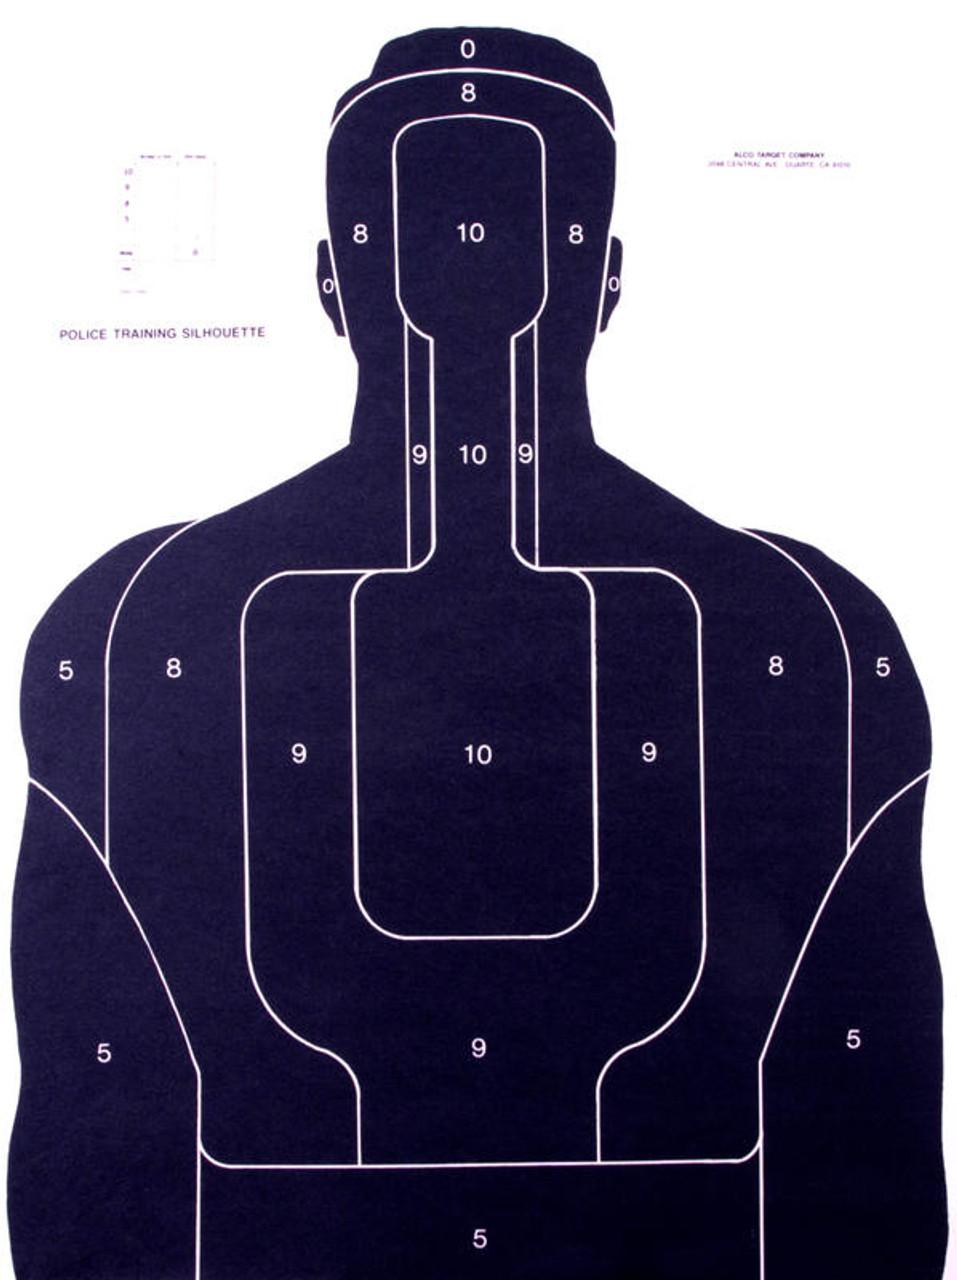 BT-5 SDPD Shooting Target